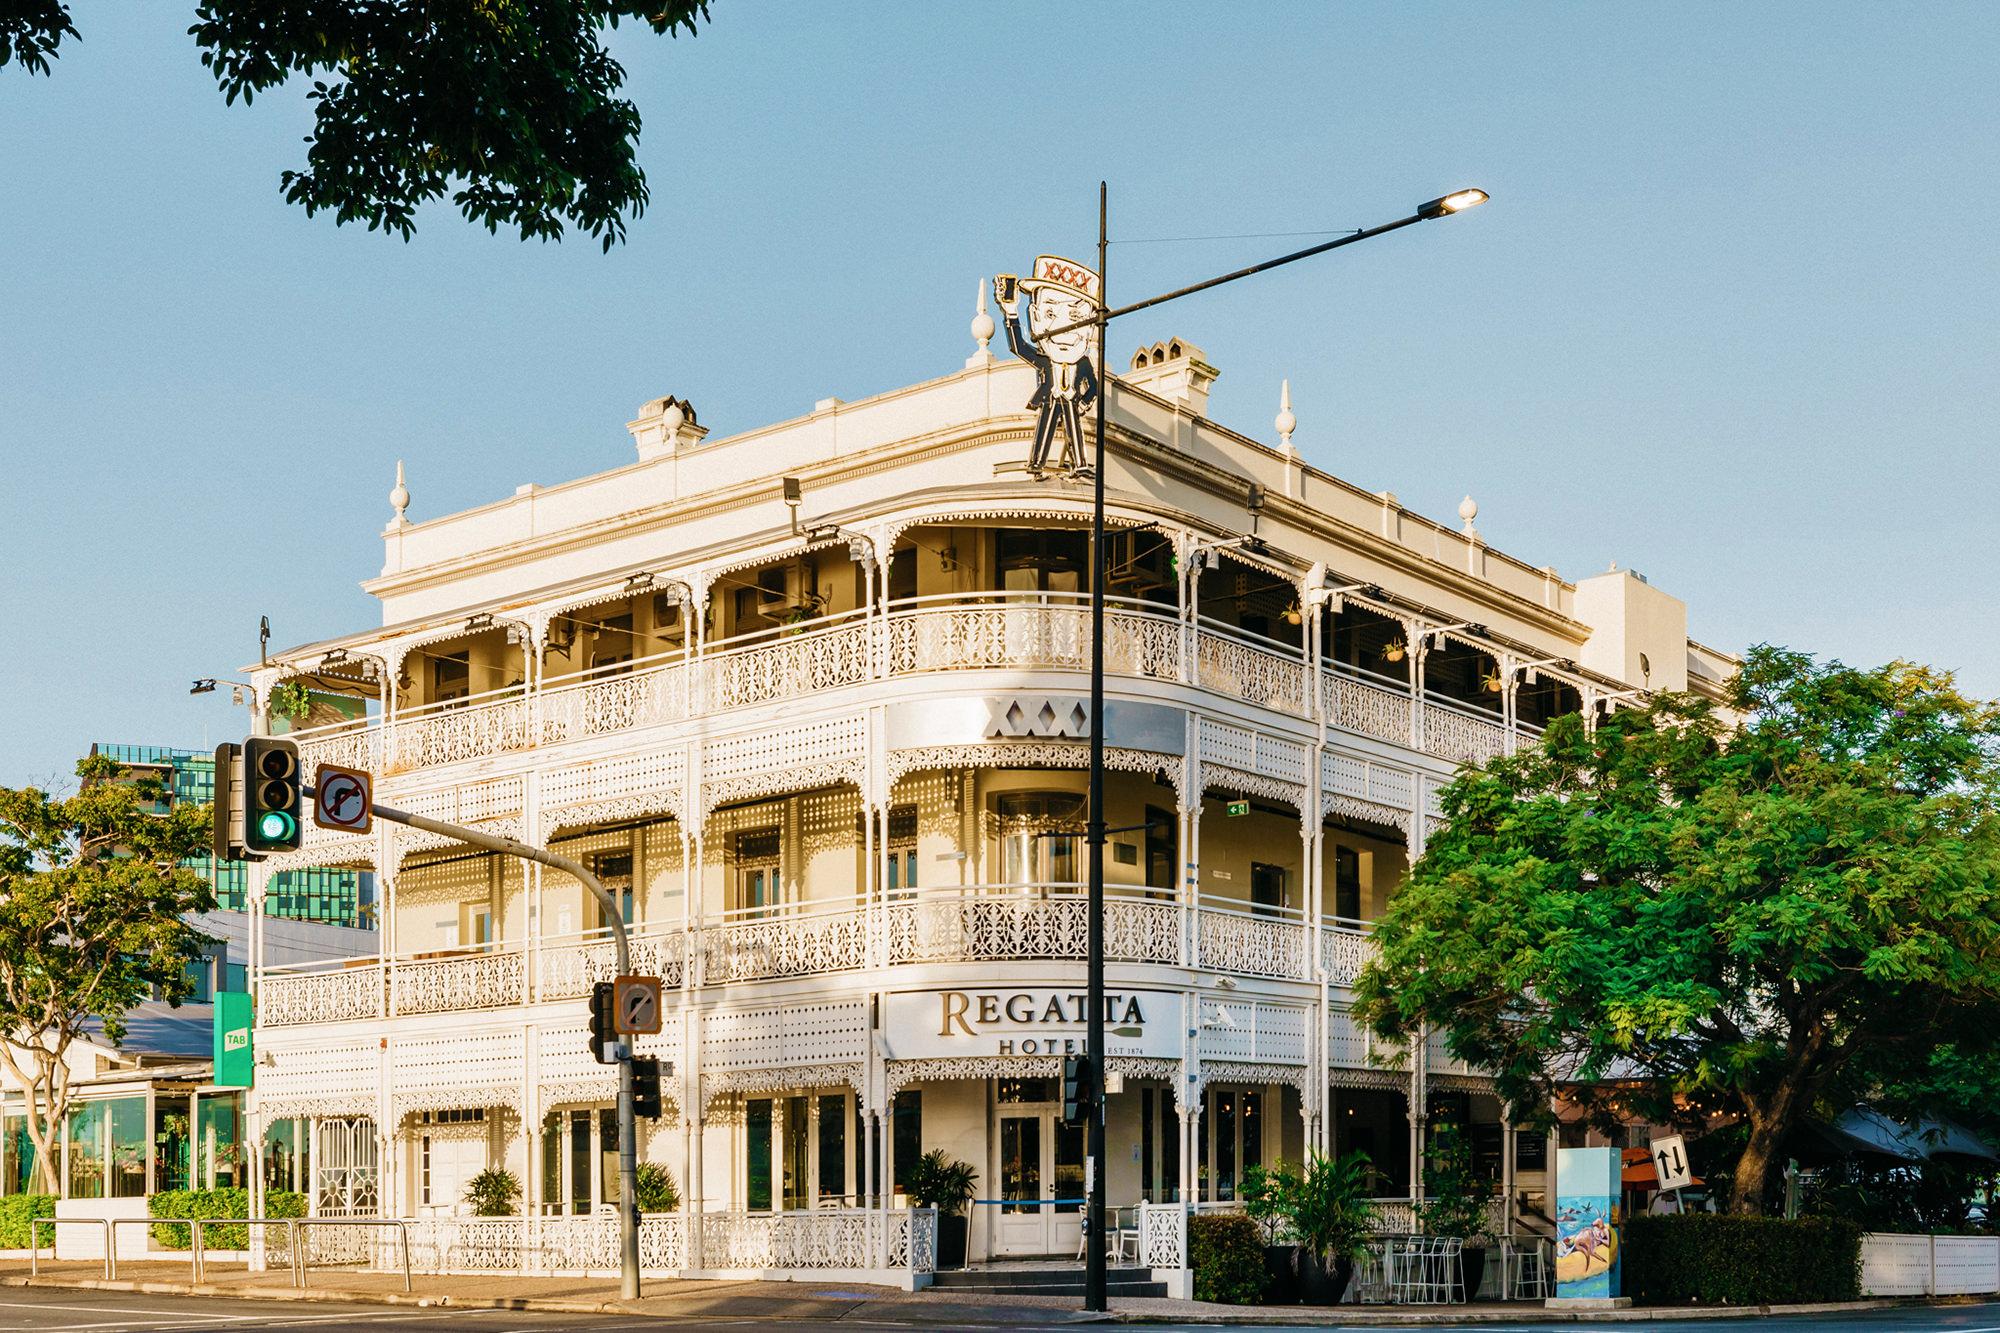 AVC operates 170 venues across the country including the landmark Regatta Hotel in Brisbane.